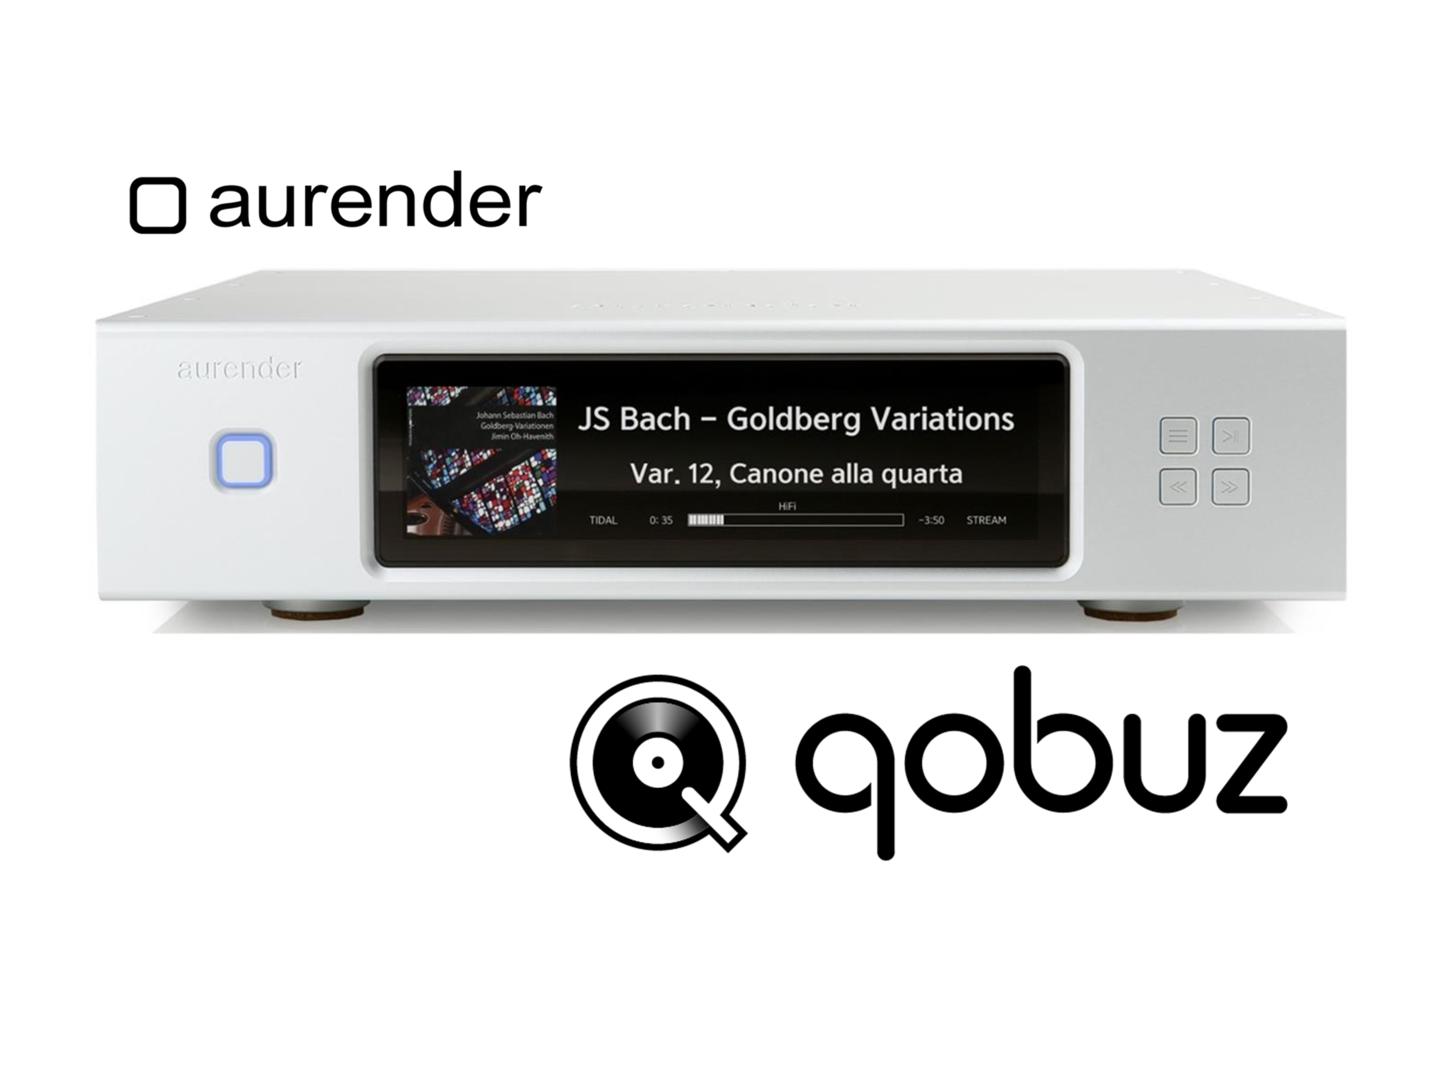 Aurender_qobuz.png